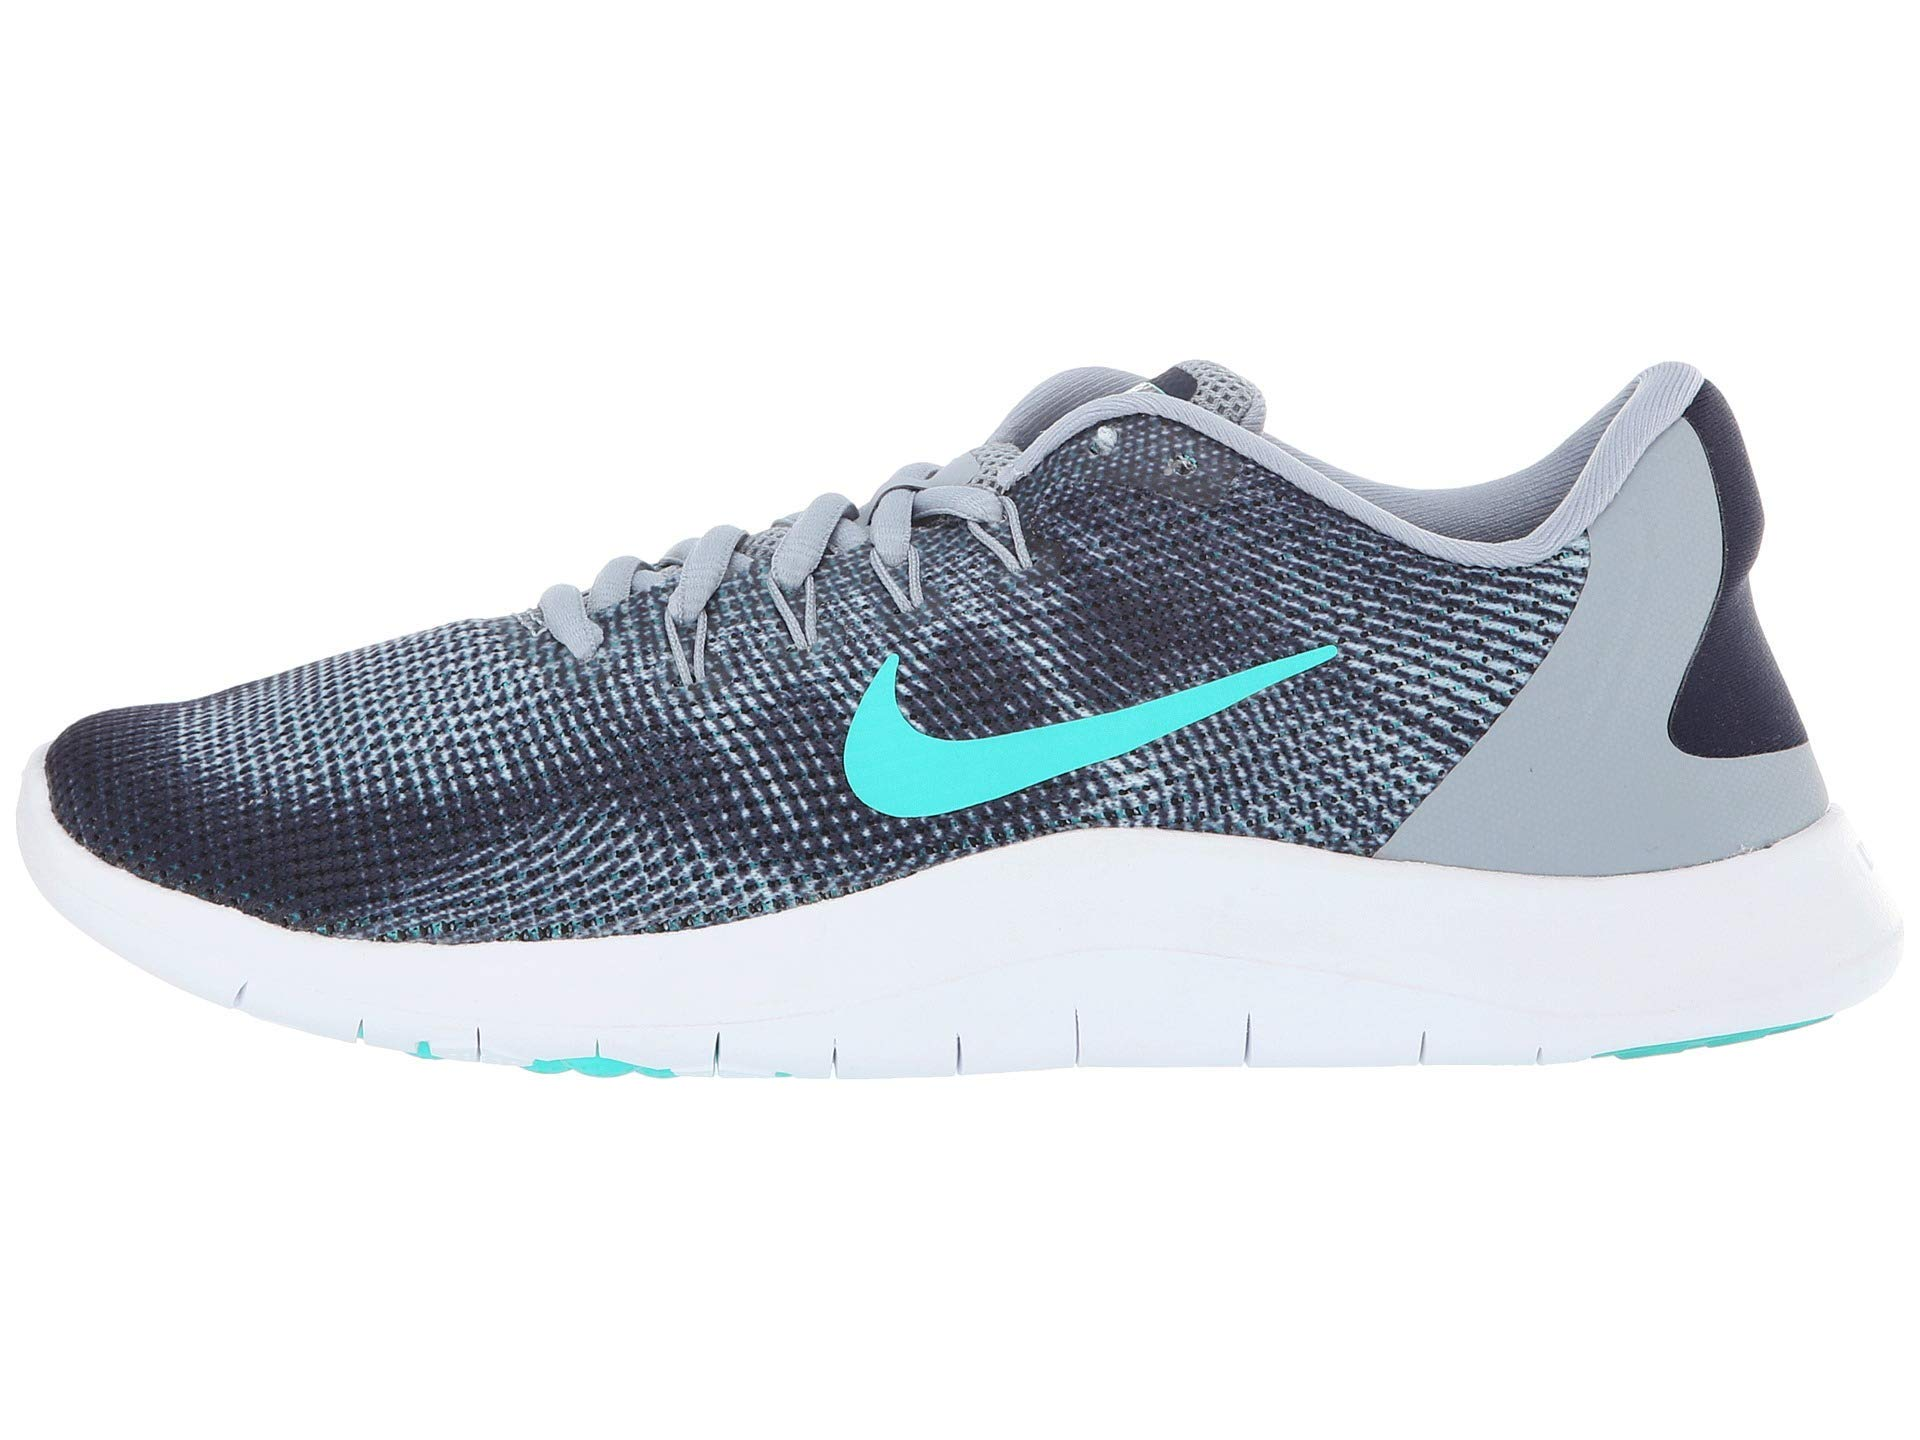 huge selection of 60739 cbe15 Nike Women's Flex 2018 RN Running Shoe (6.5 B US, Obsidian Mist/Hyper Jade)